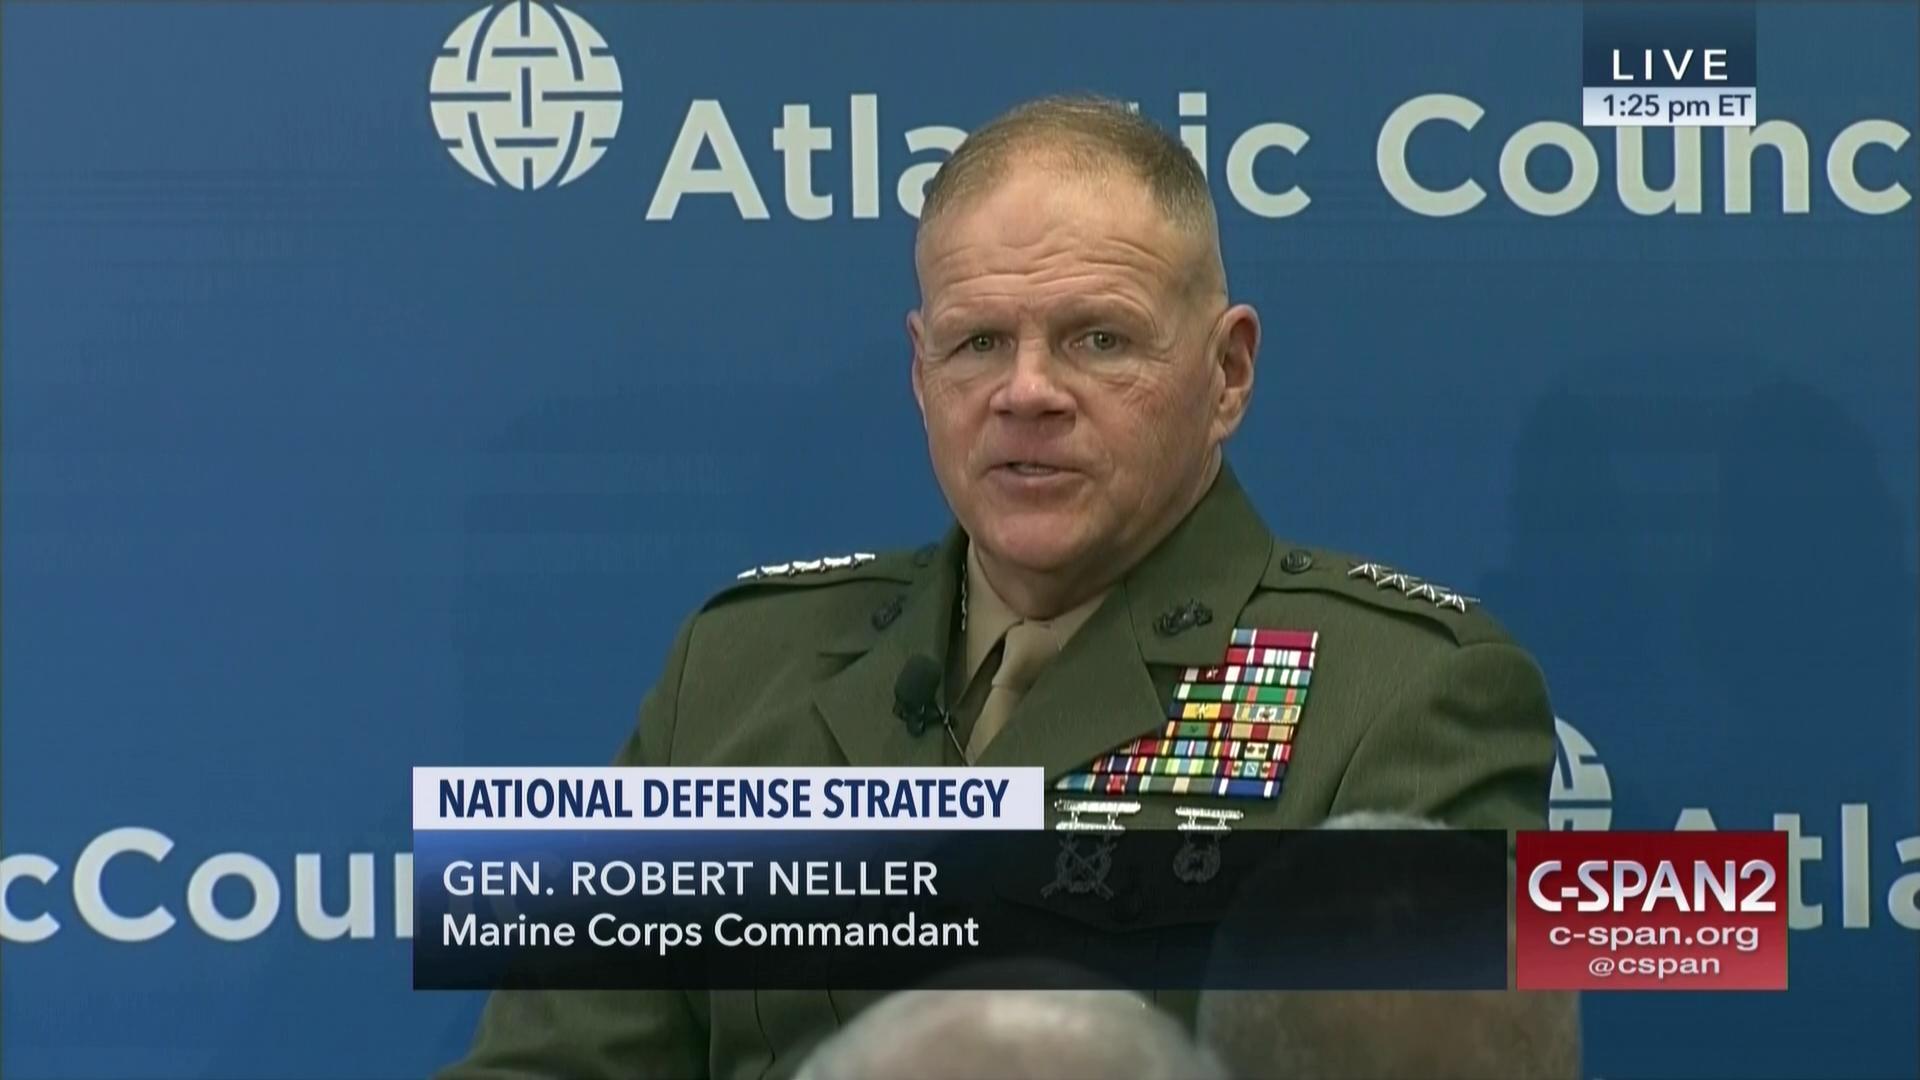 Marine Commandant Neller Discusses National Defense Strategy Mar 29